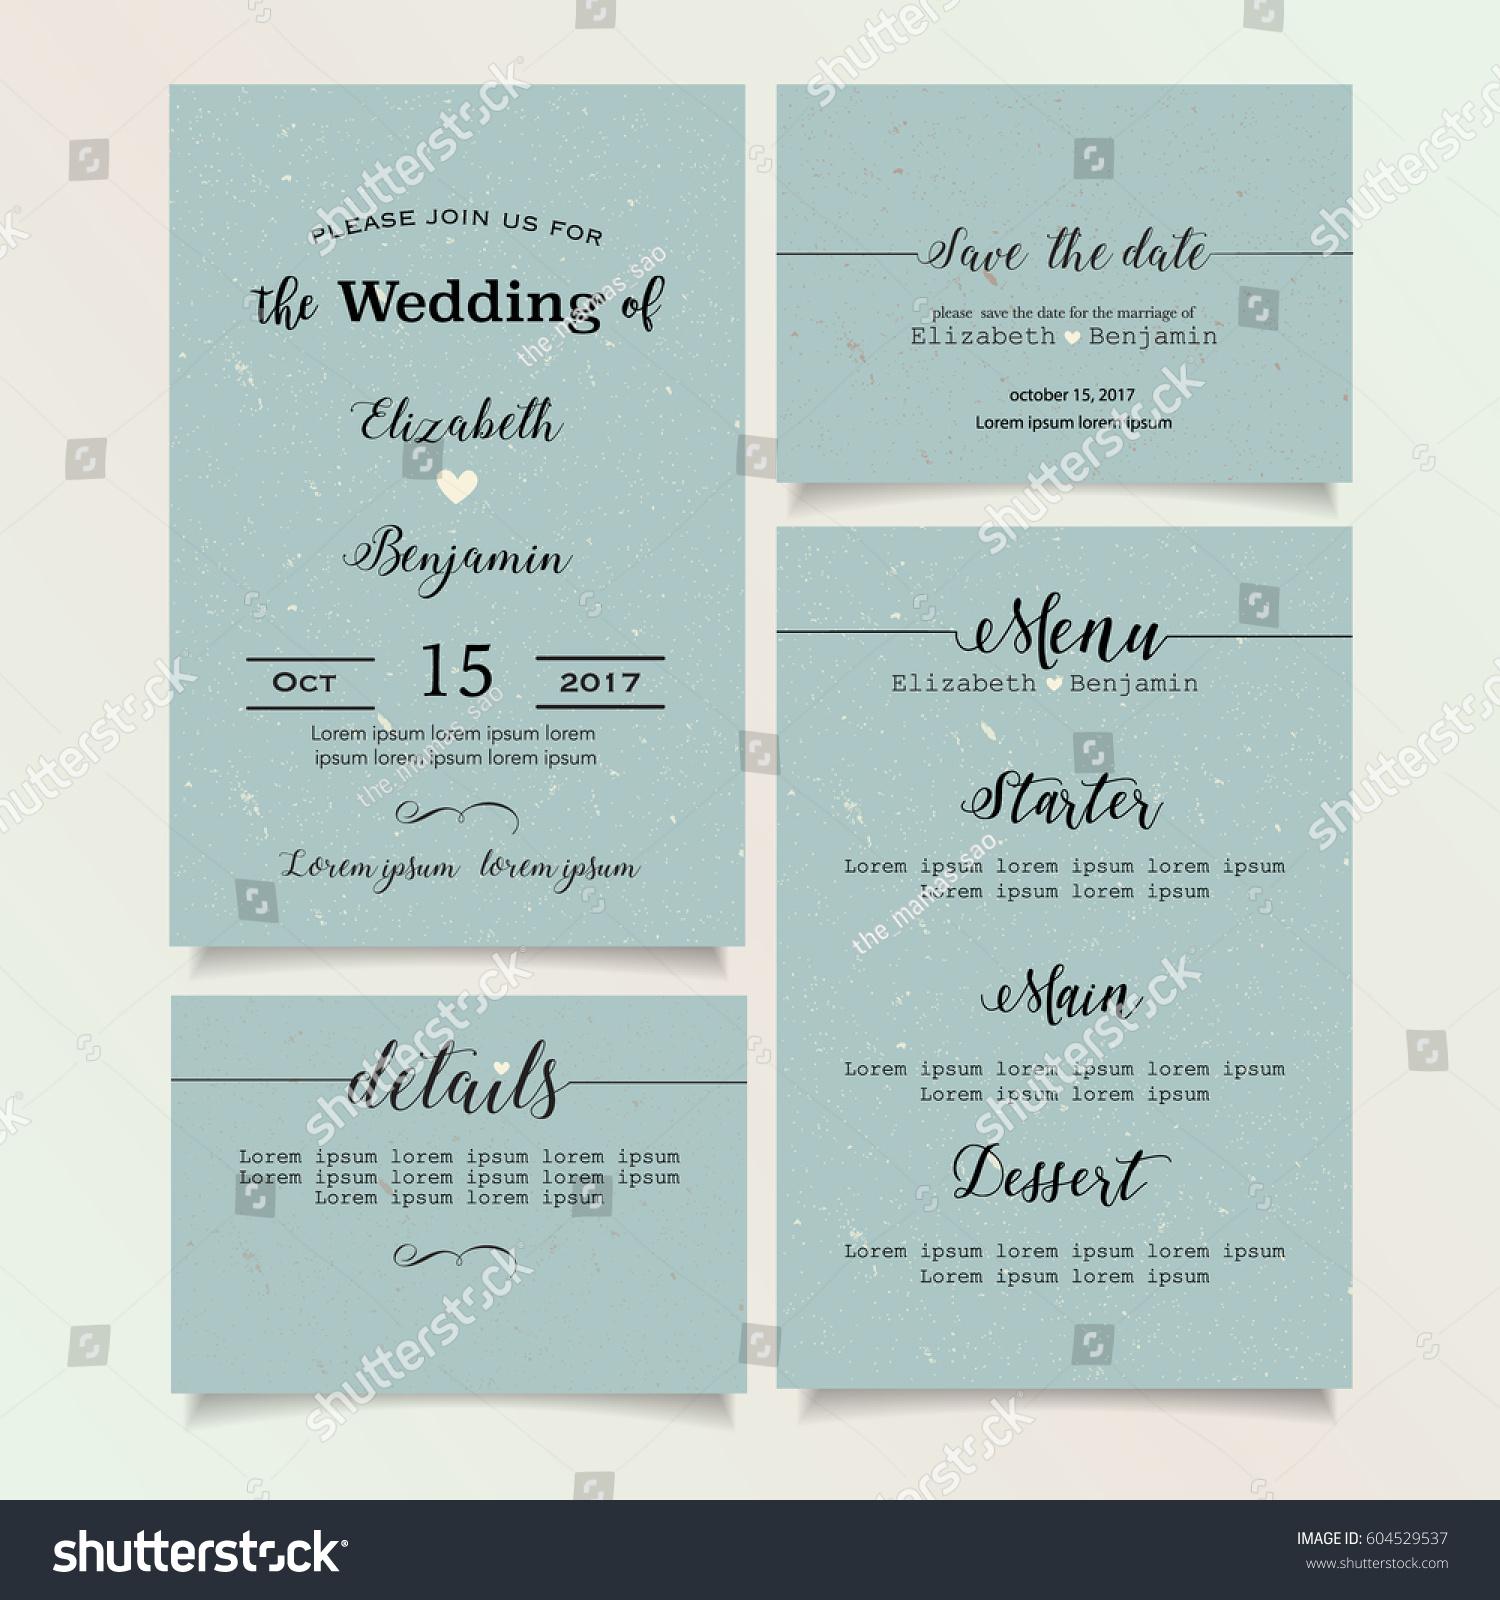 Beautiful vintage wedding invitation card details stock vector beautiful vintage wedding invitation card details card save the date card menu card stopboris Image collections